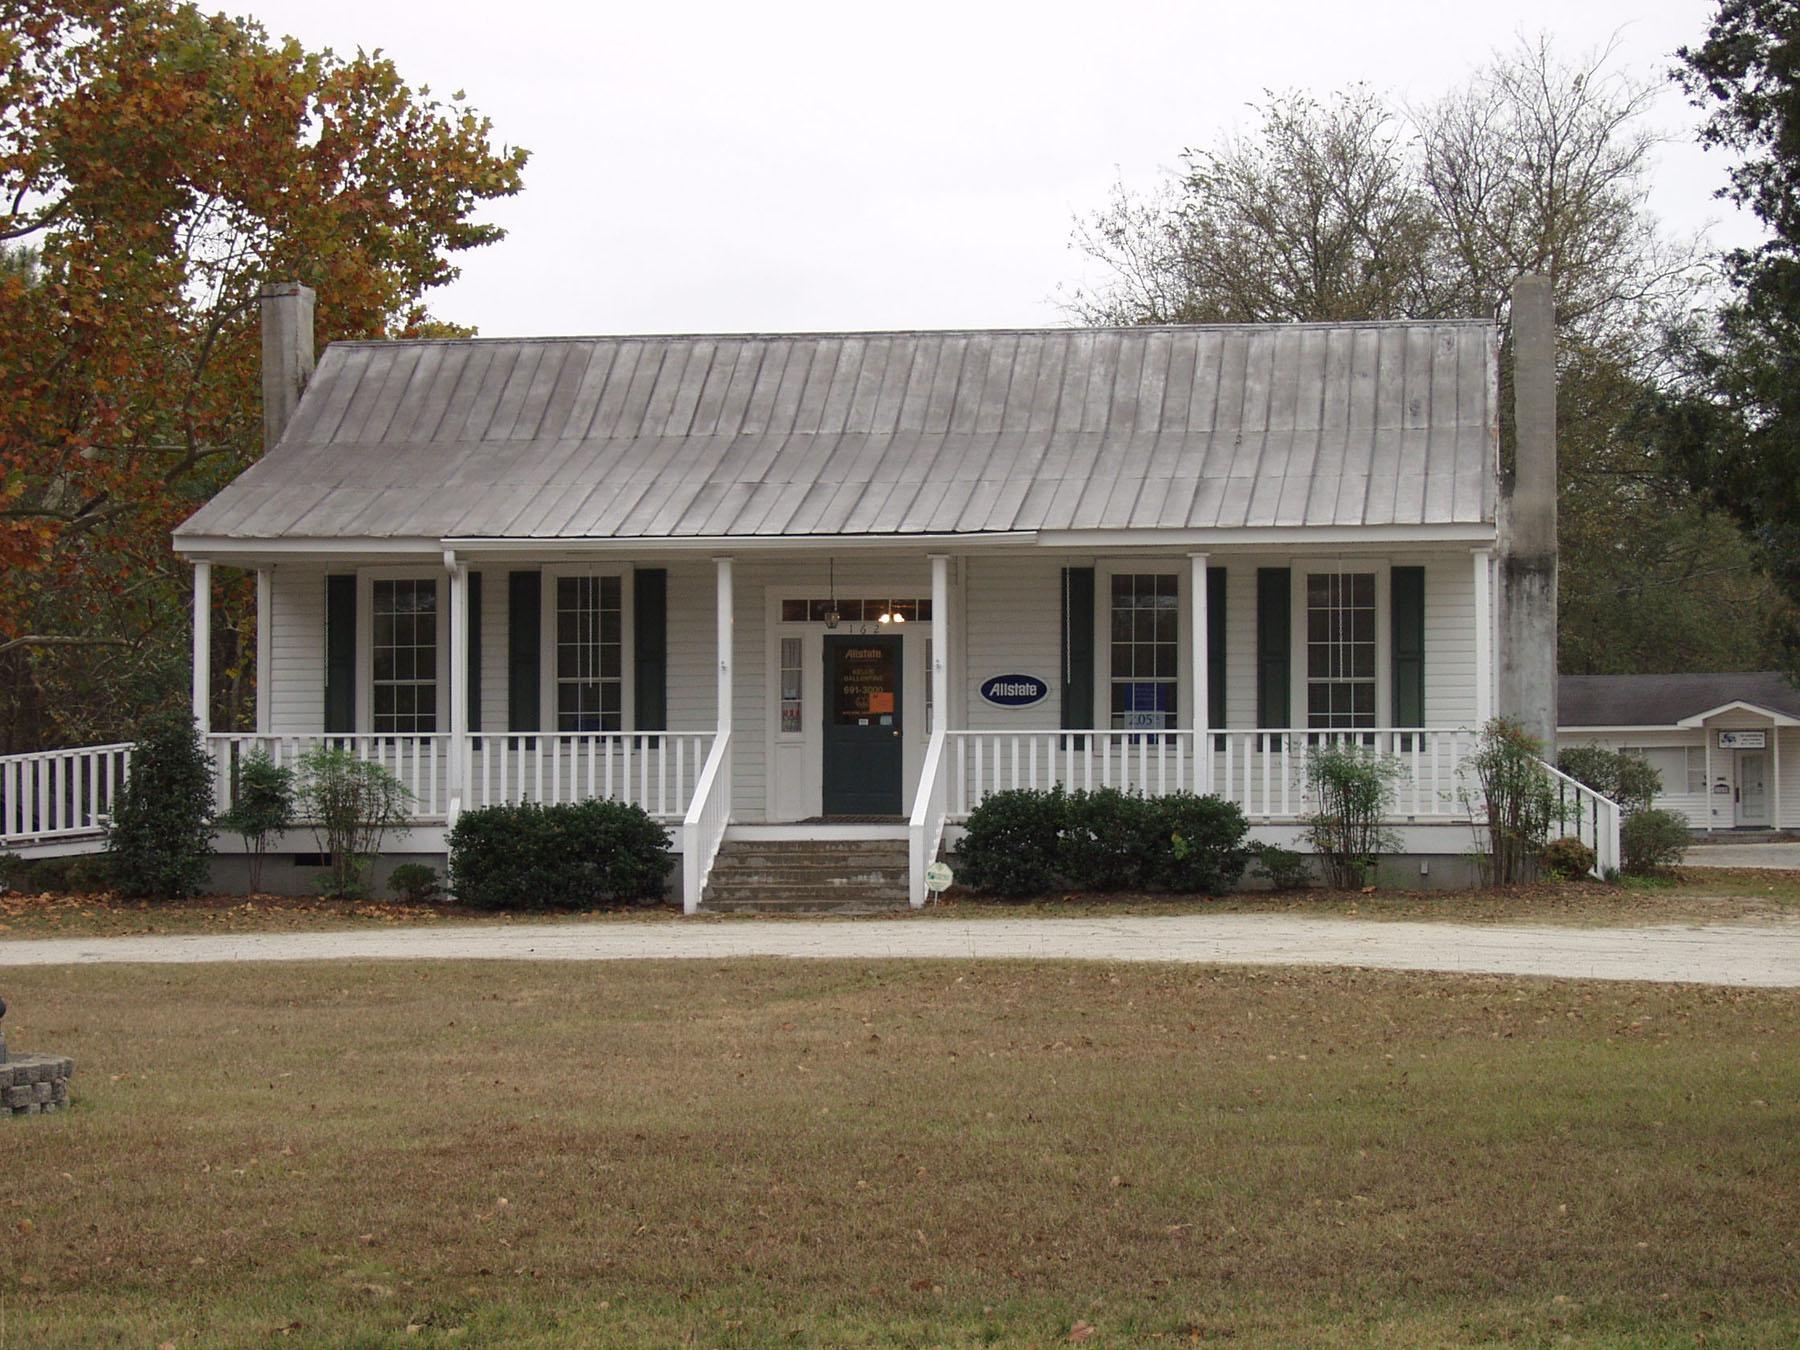 Boney Hykil House built in 1859.  Photo by Jim Mclean